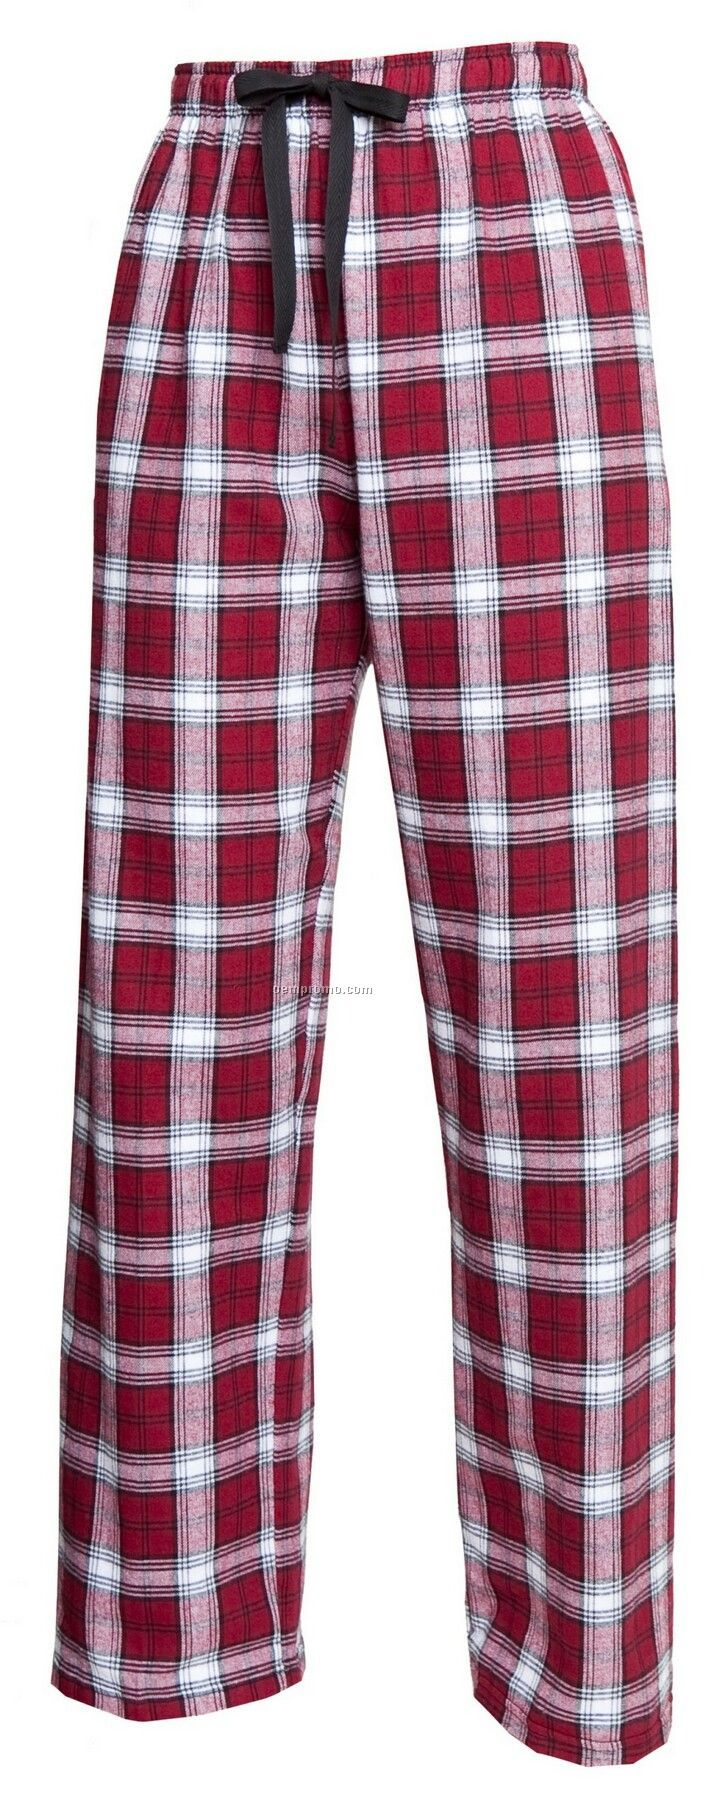 Pants China Wholesale Pants